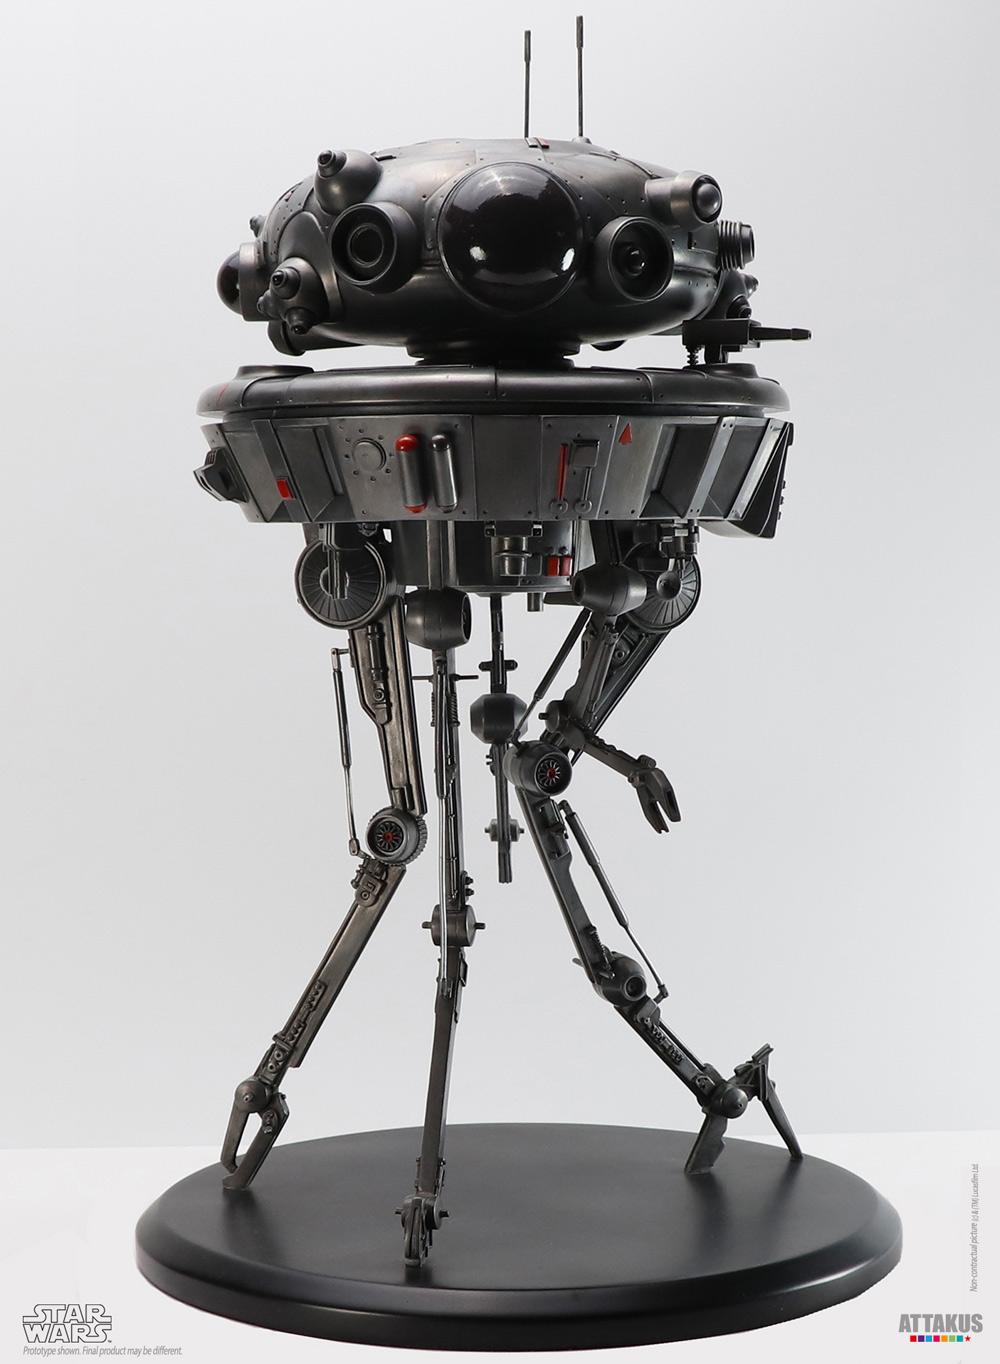 Probe Droid Statue Star Wars Elite Collection 1/10 - ATTAKUS Prode_13